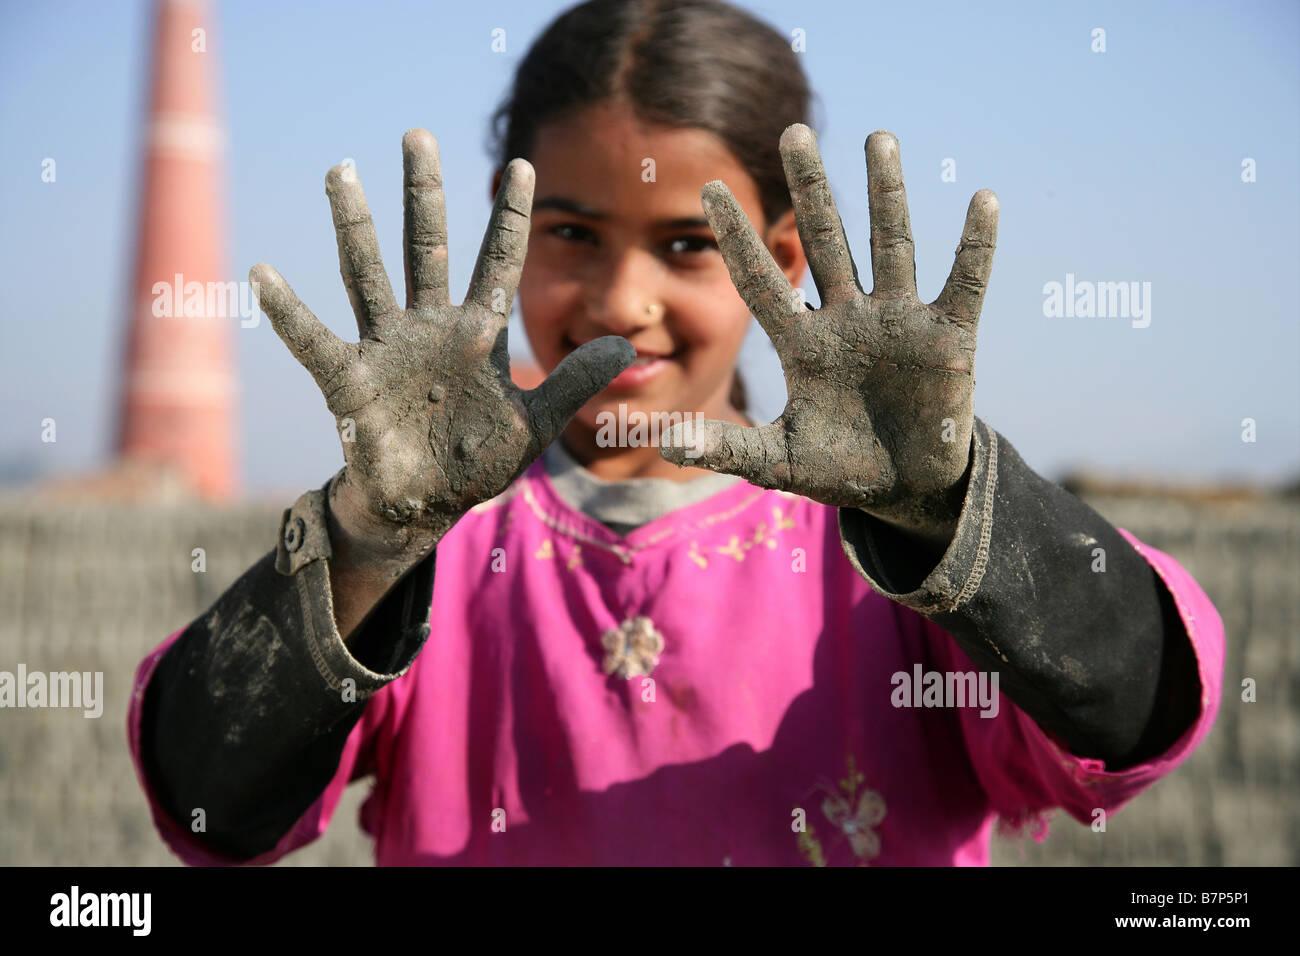 Prava Thapa dirty hands - Stock Image